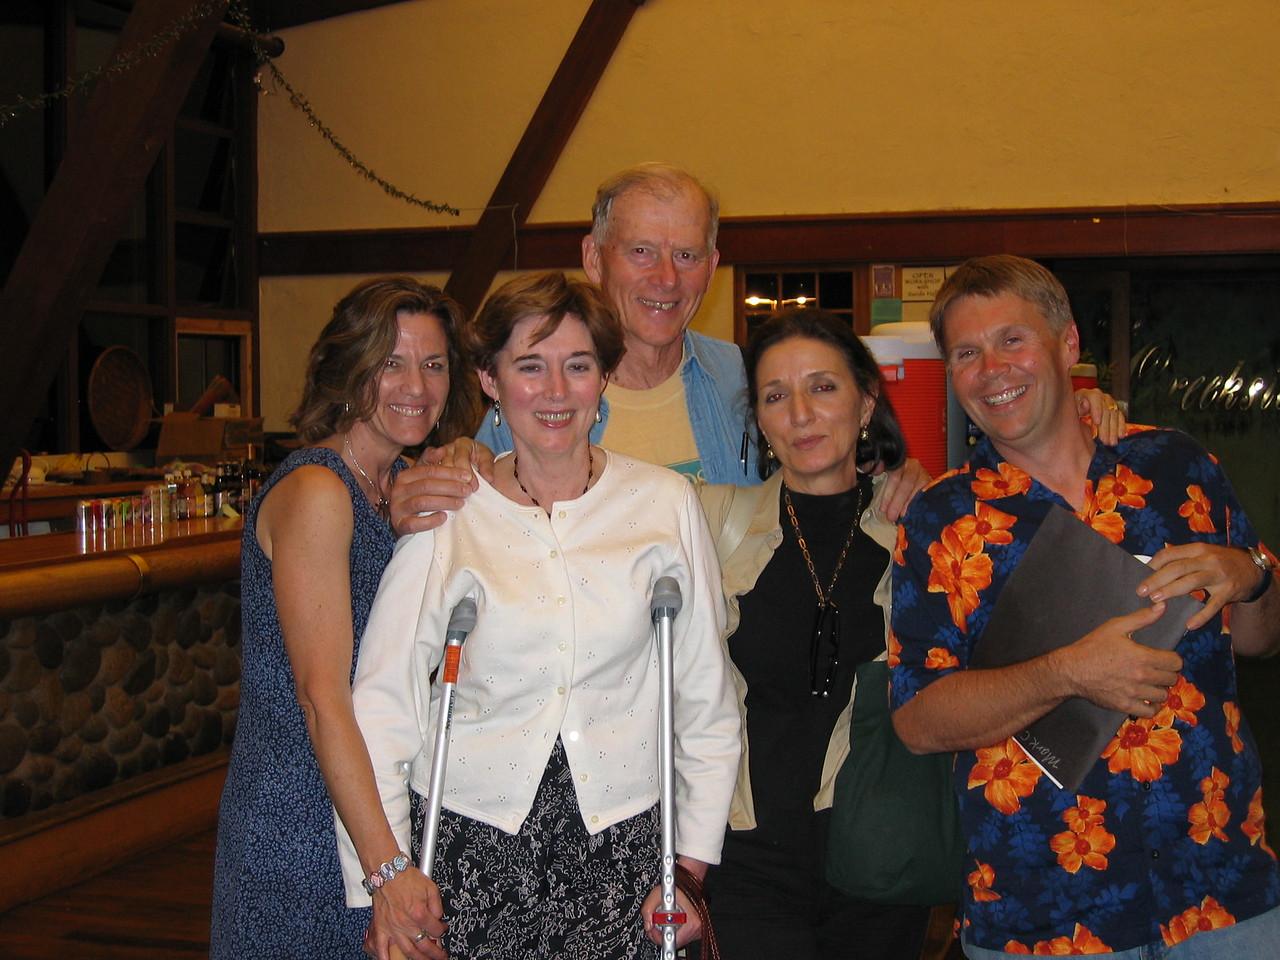 Sands Hall, Ann Close, James D. Houston, Lynn Freed and Mark Childress